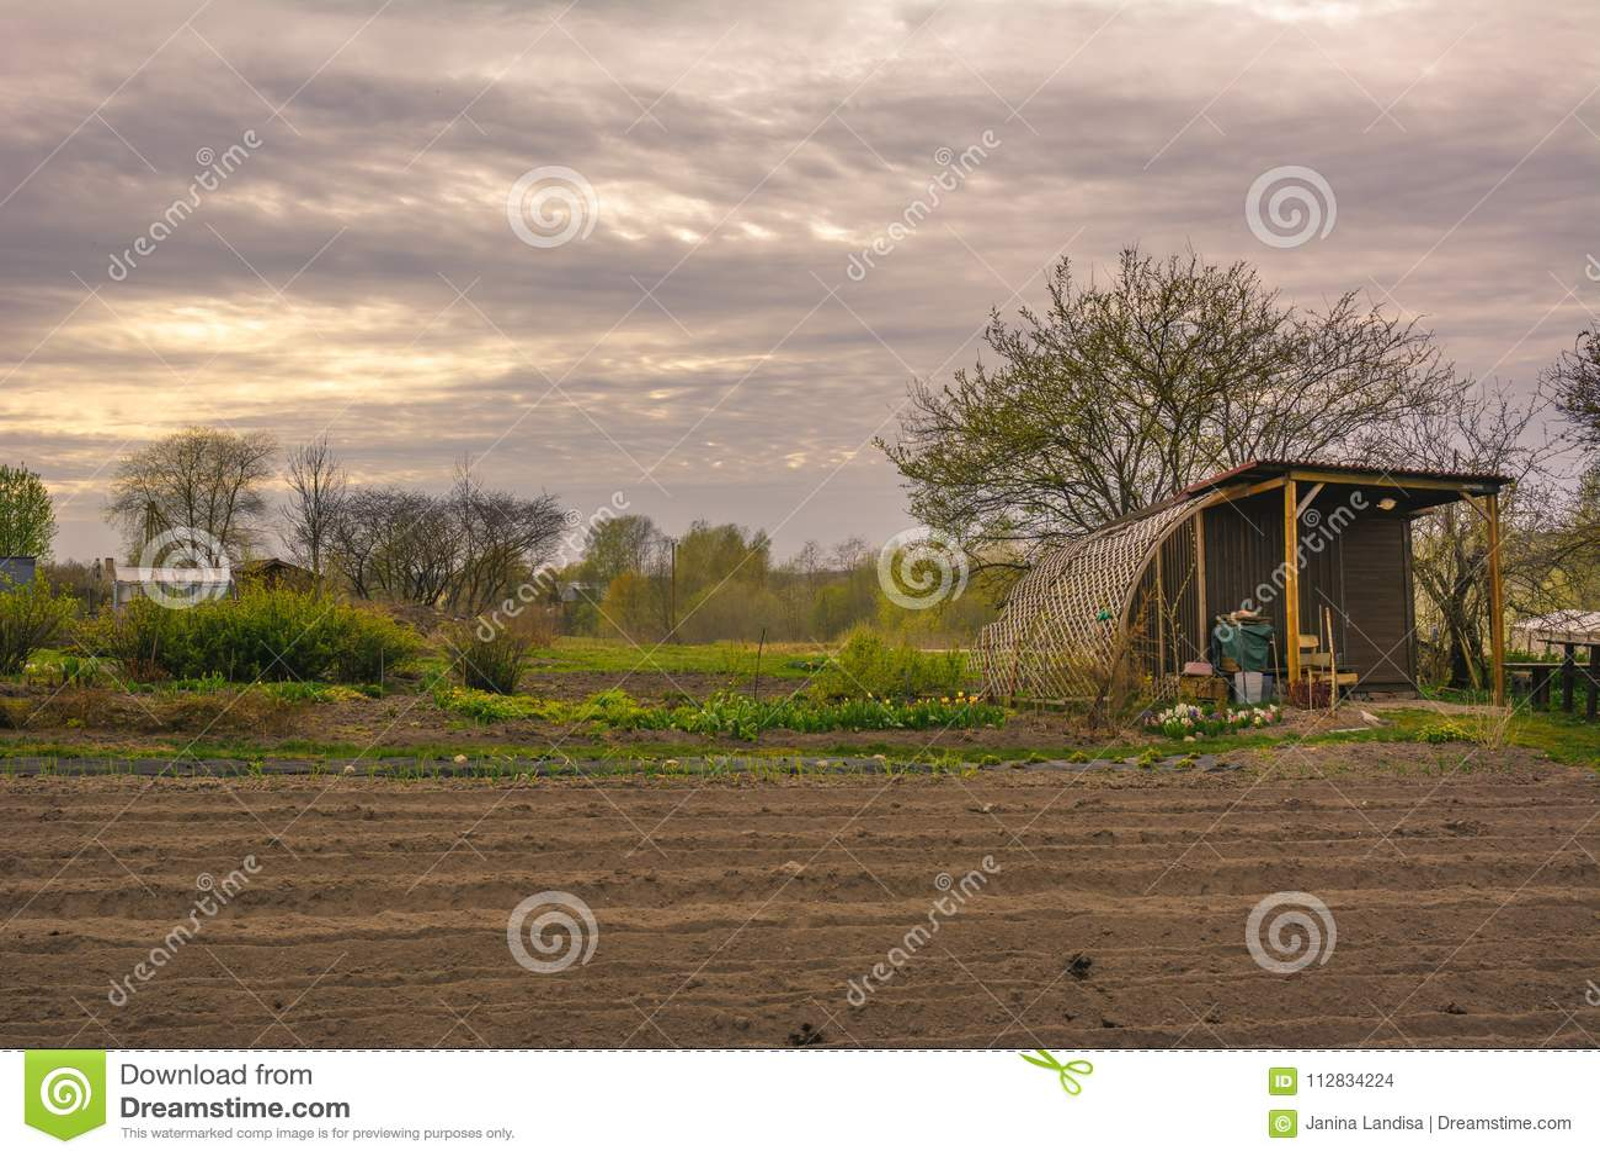 Small Garden House In A Garden With Furrow Rows In Spring. Naked ...